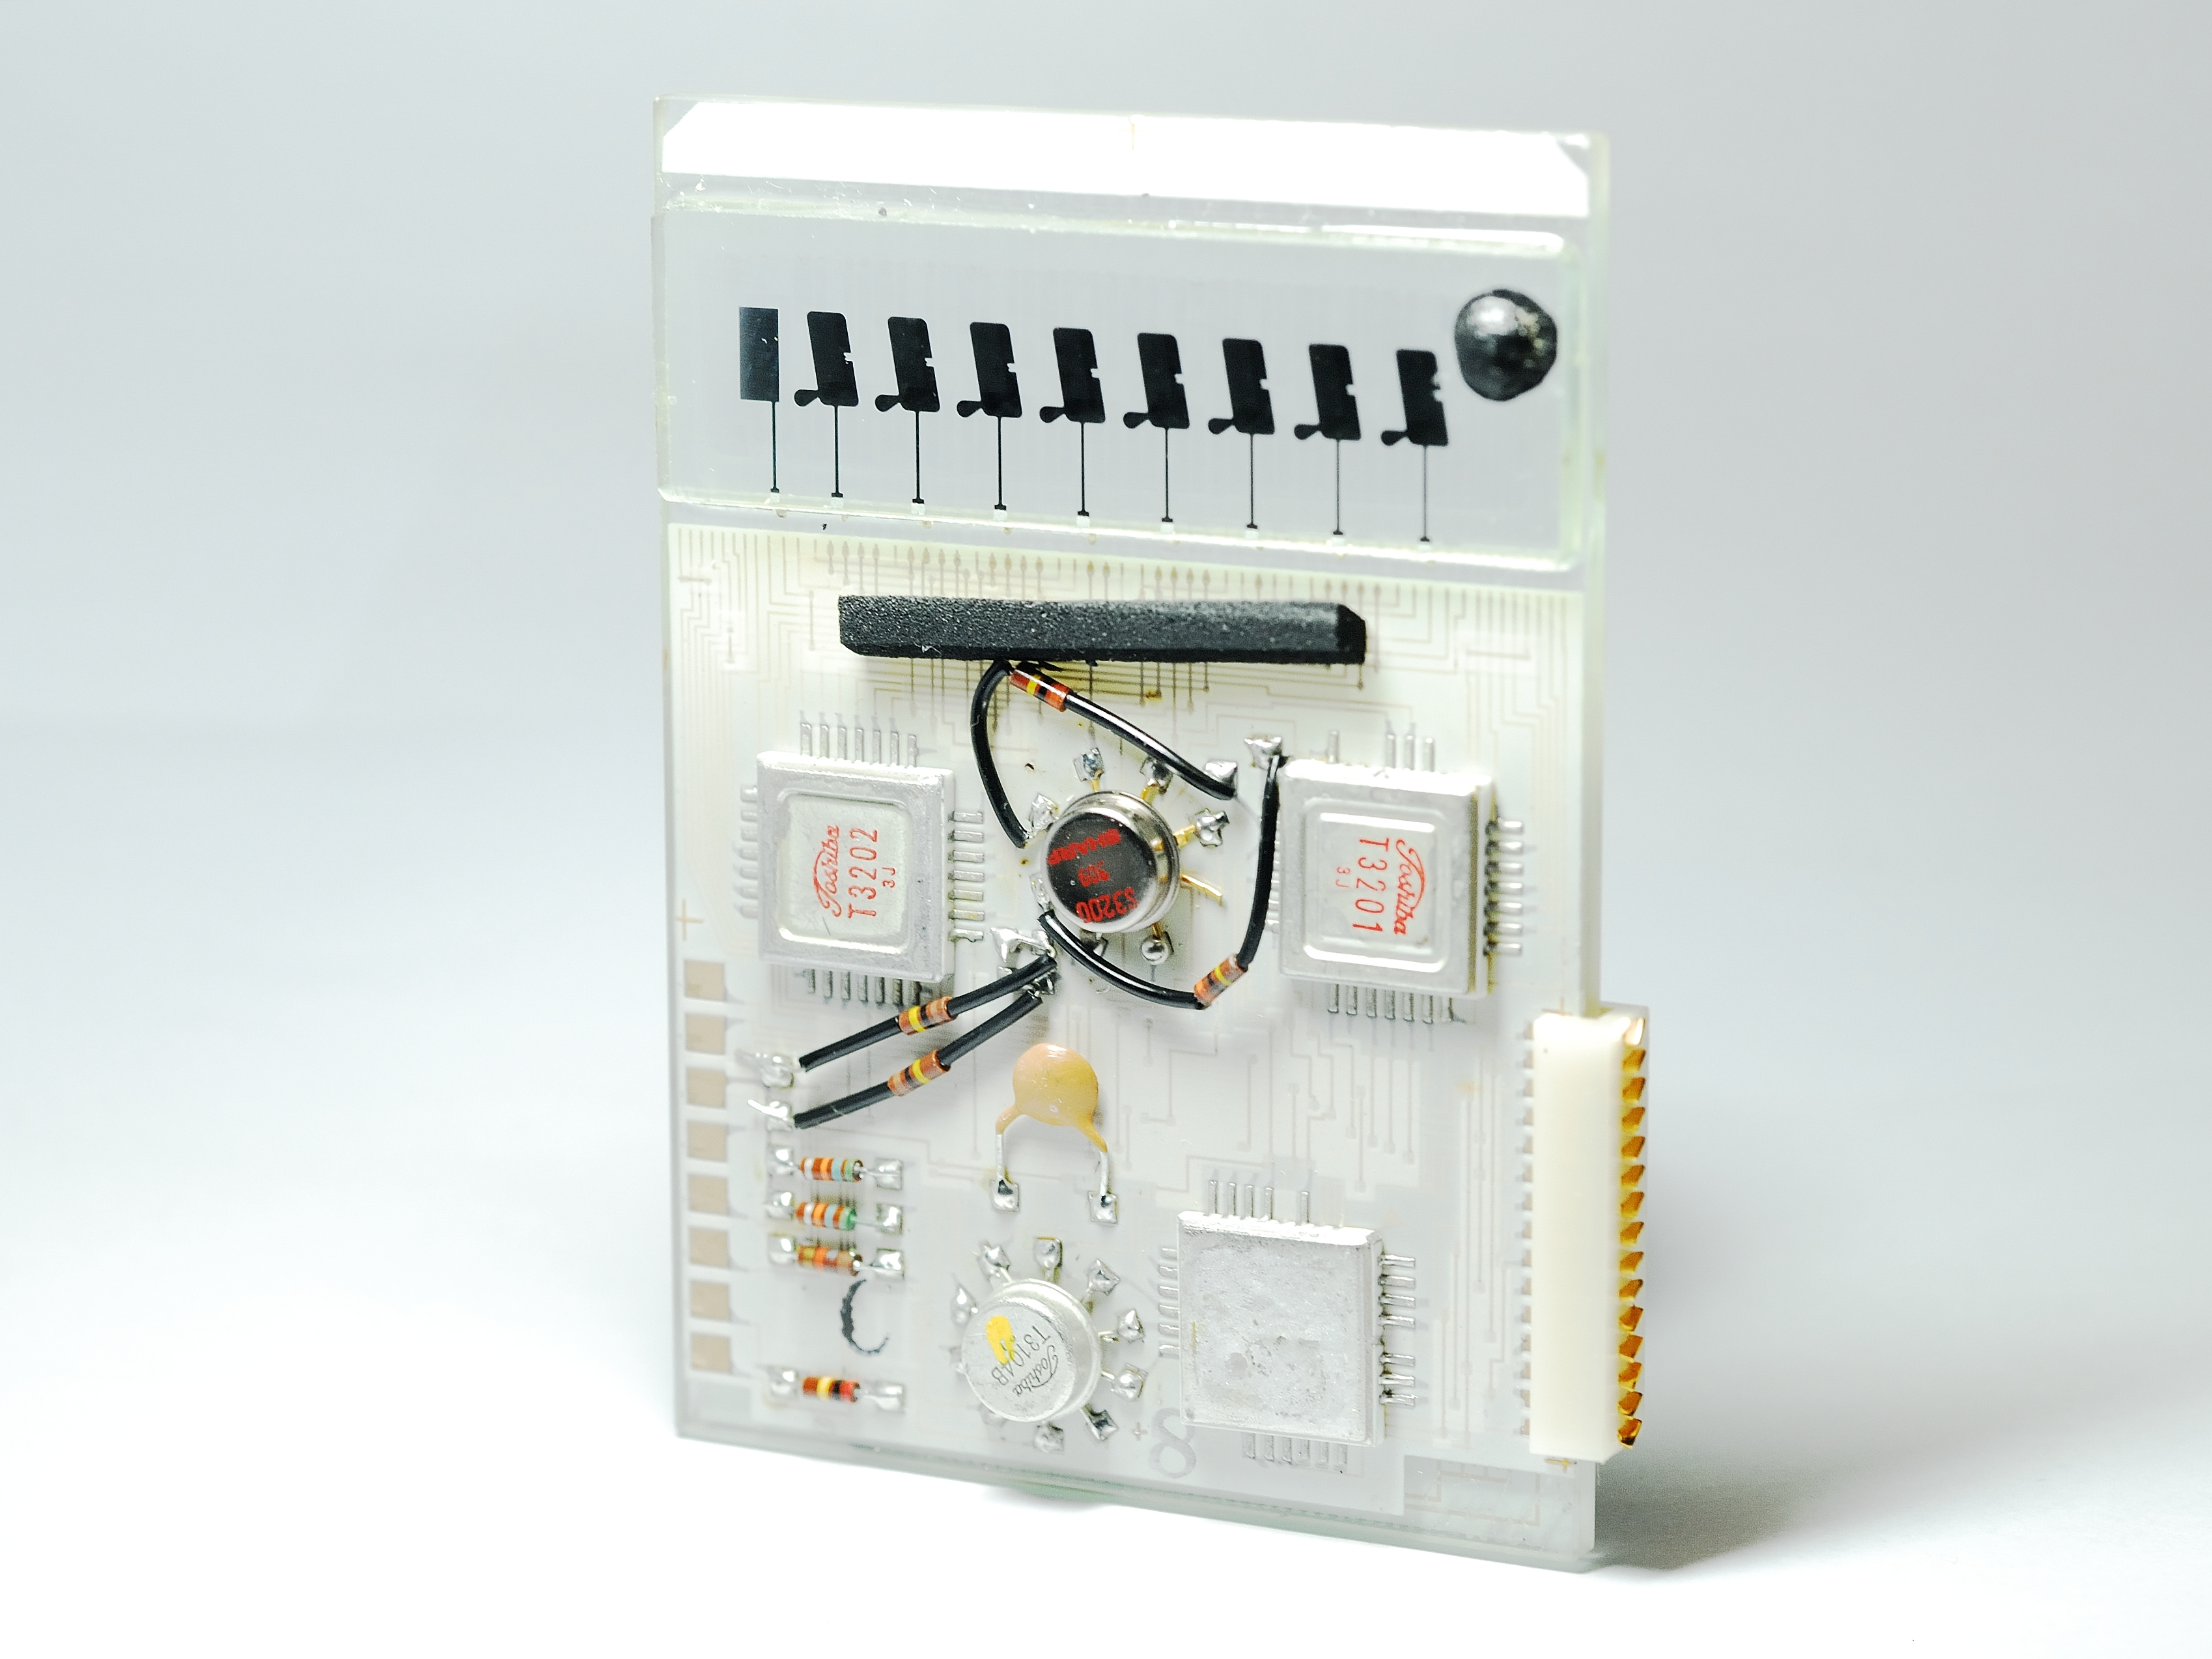 Fileback Side Of Glass Circuit Board In Sharp El 805 Calculator Electrical Wiring Made